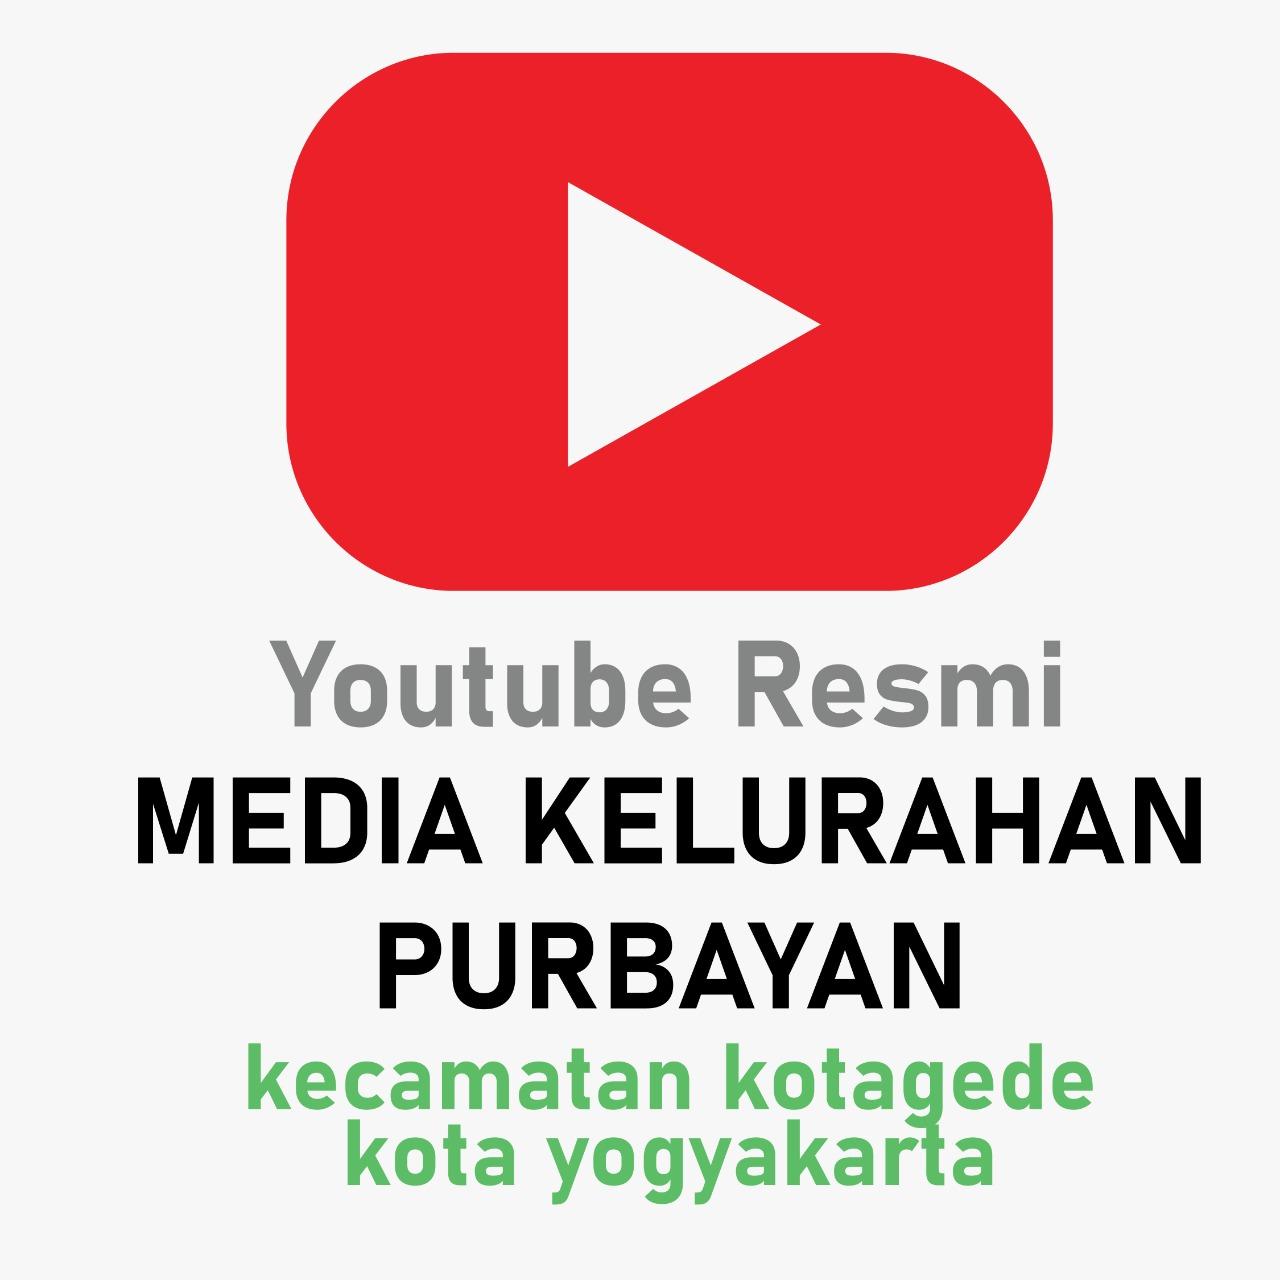 Youtube Media Kelurahan Purbayan